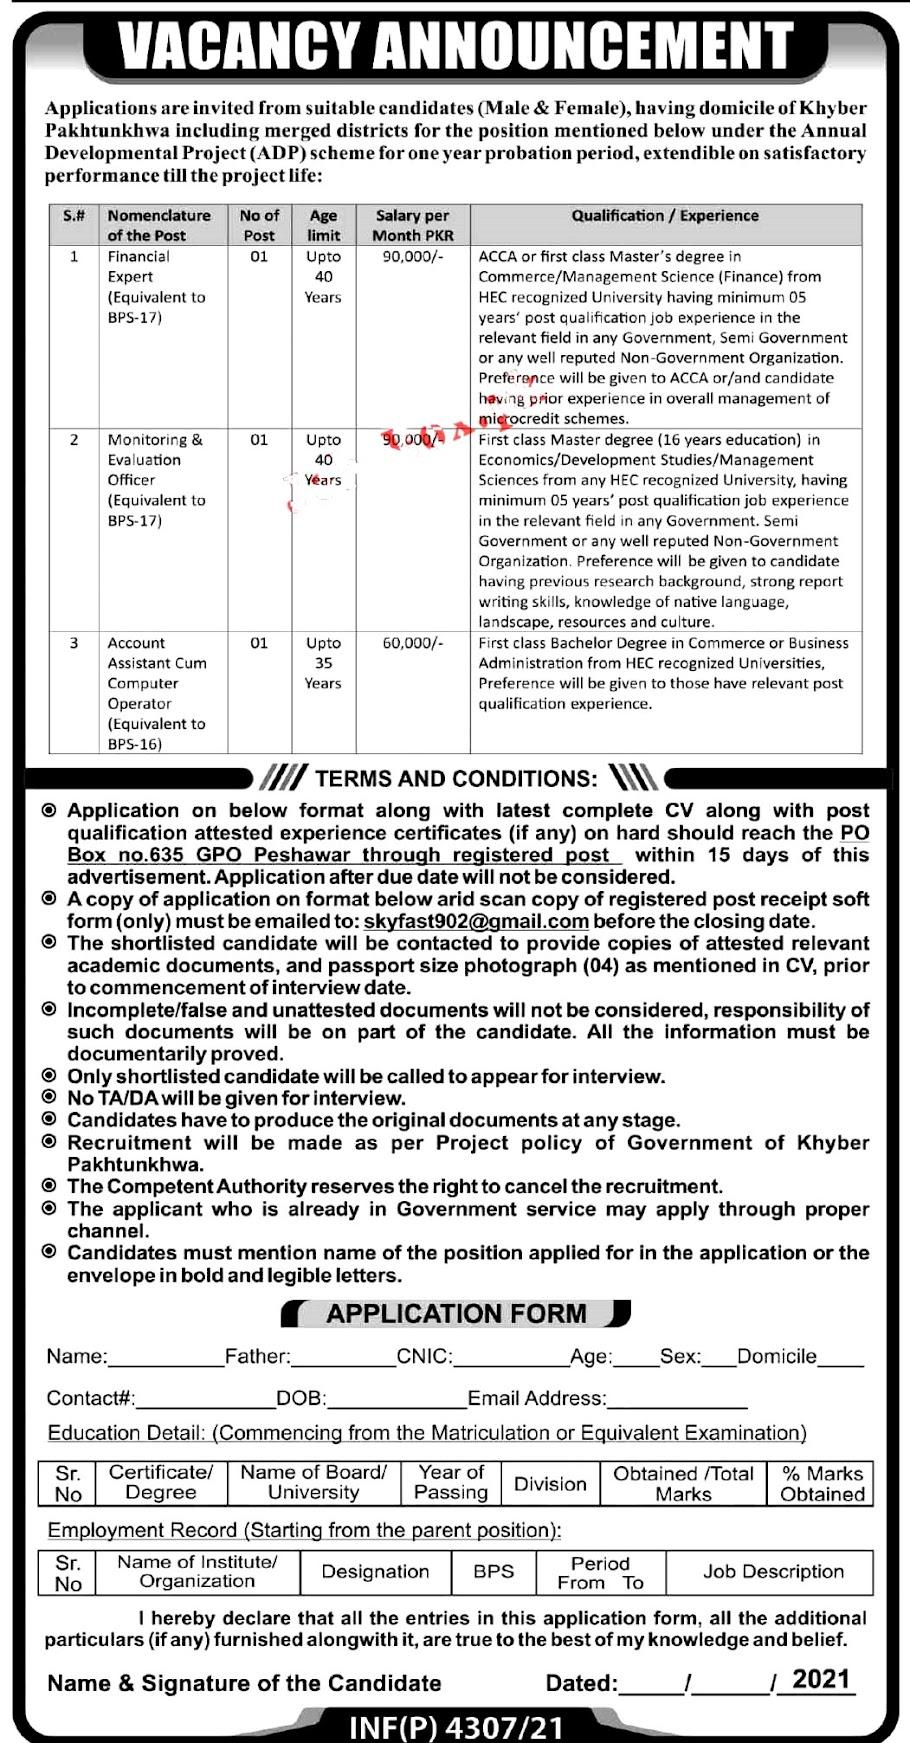 Latest Jobs Public Sector Organization PO Box 635  Application Form Download